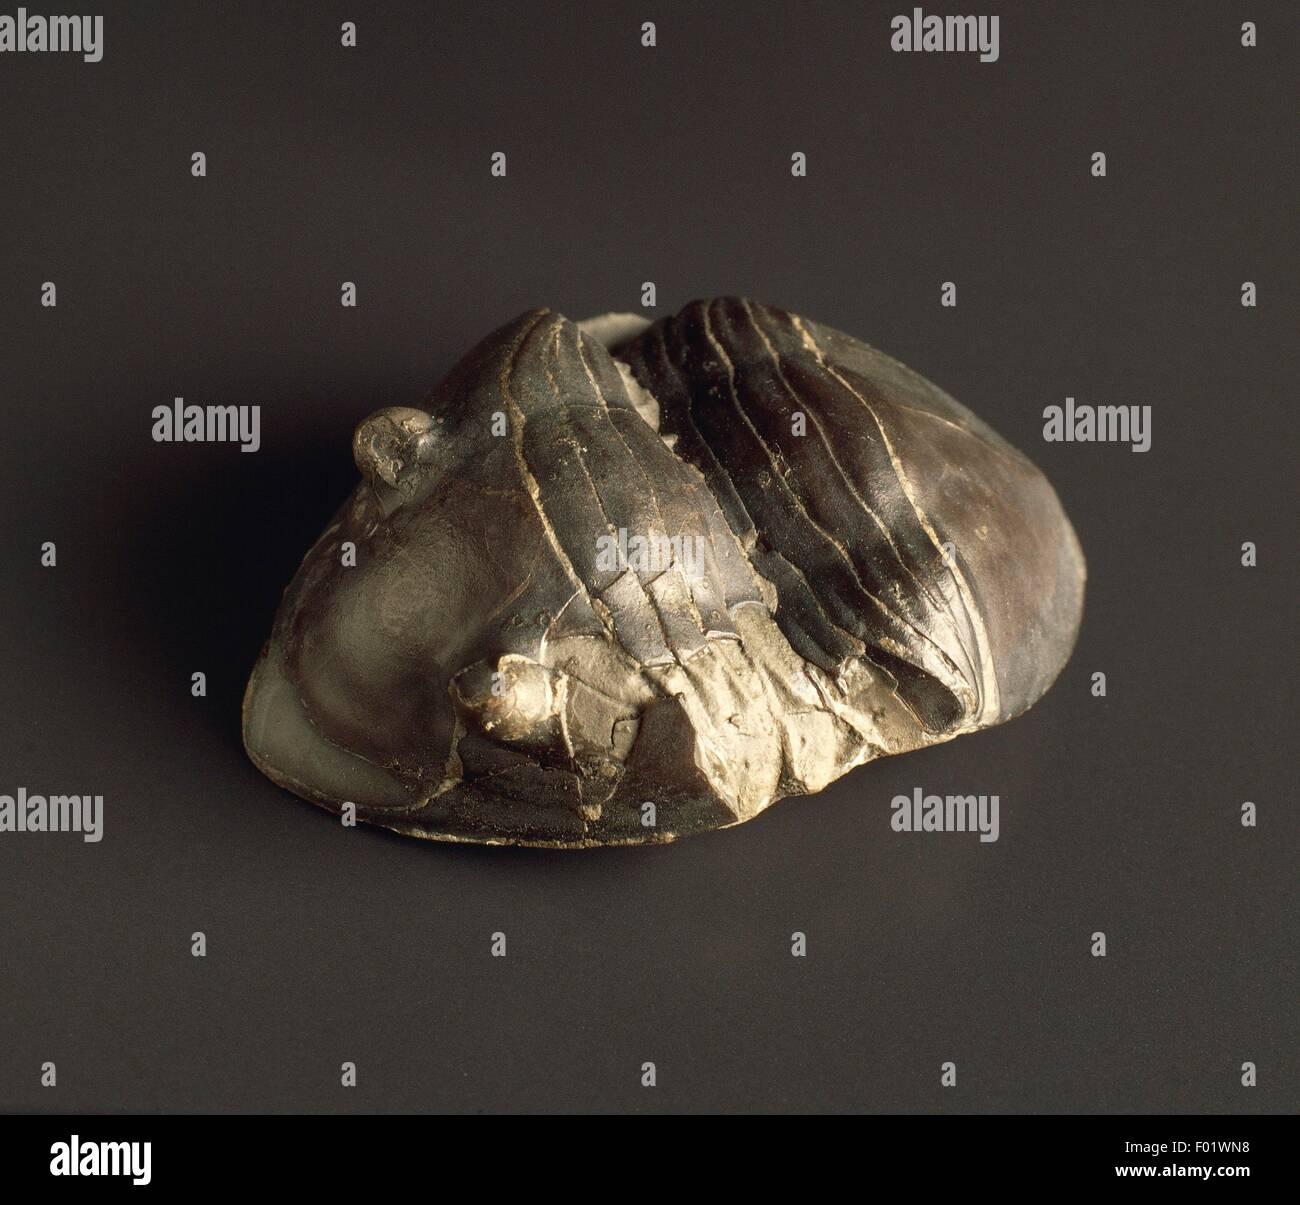 Fossilien - Protostomia - Gliederfüsser - Trilobiten - Isotelus Gigas - Ordovizium. Stockbild